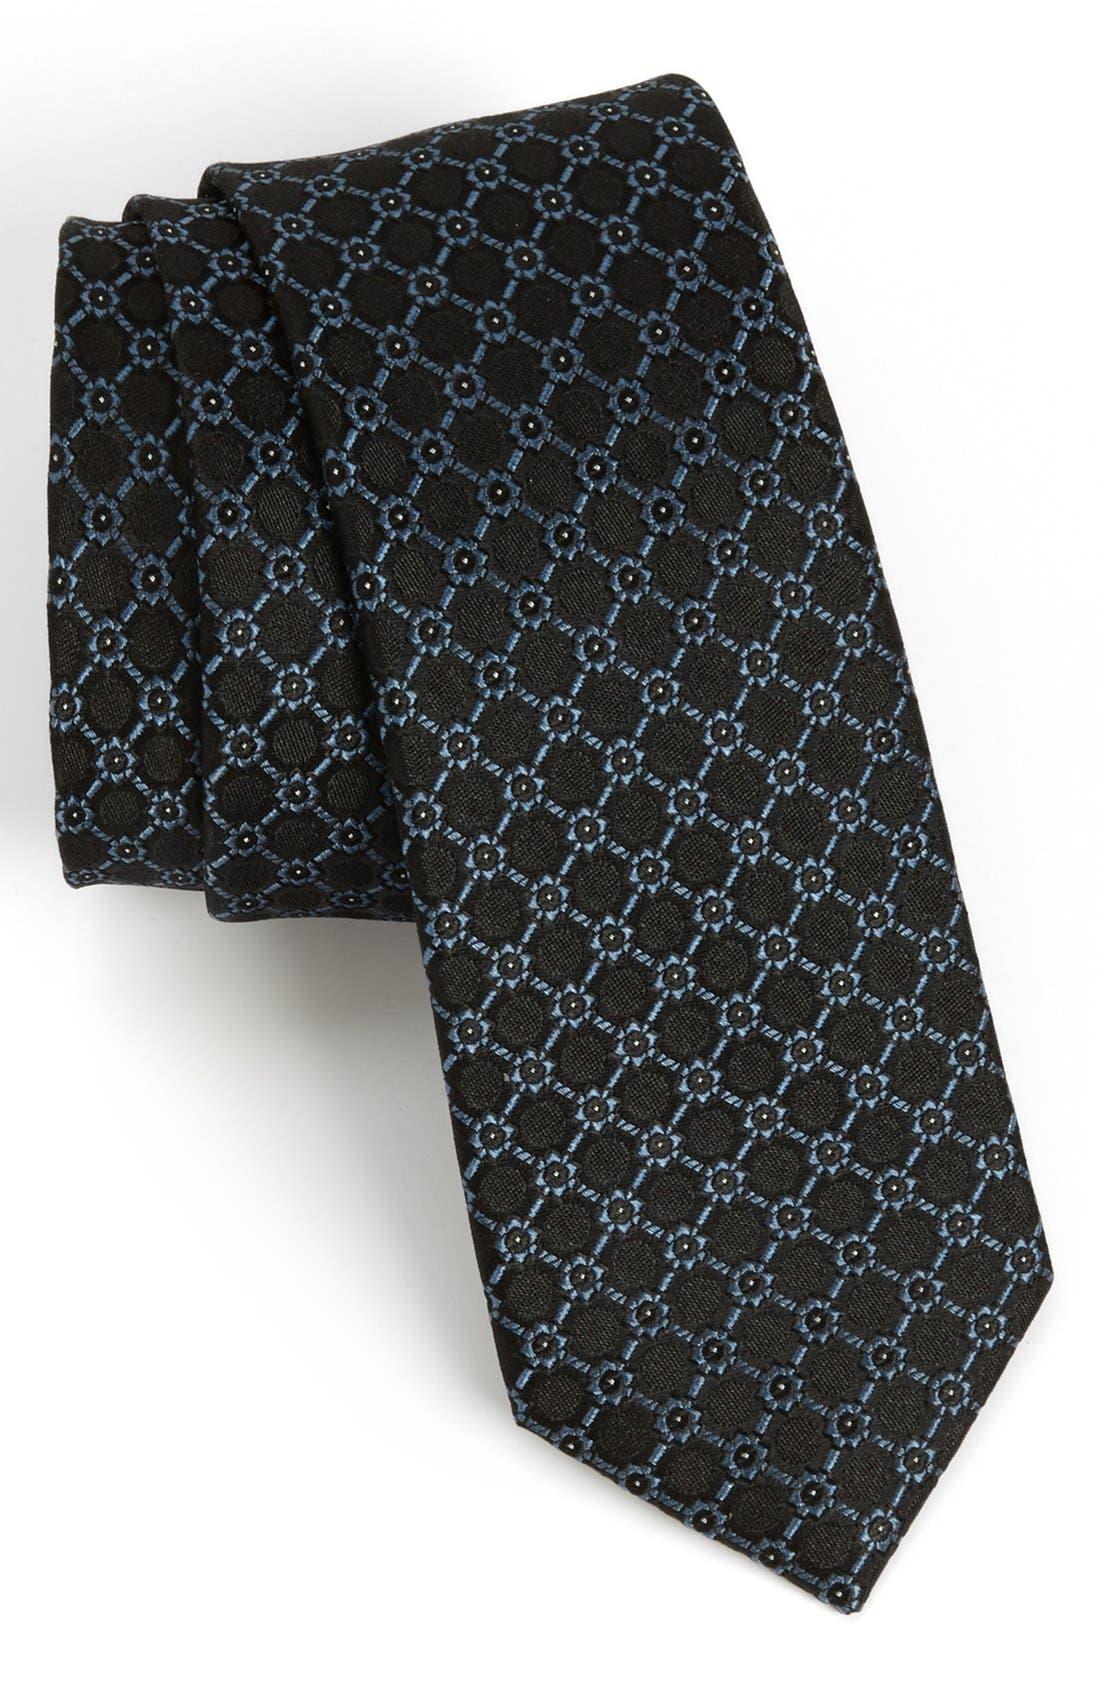 Main Image - The Tie Bar Woven Silk Tie